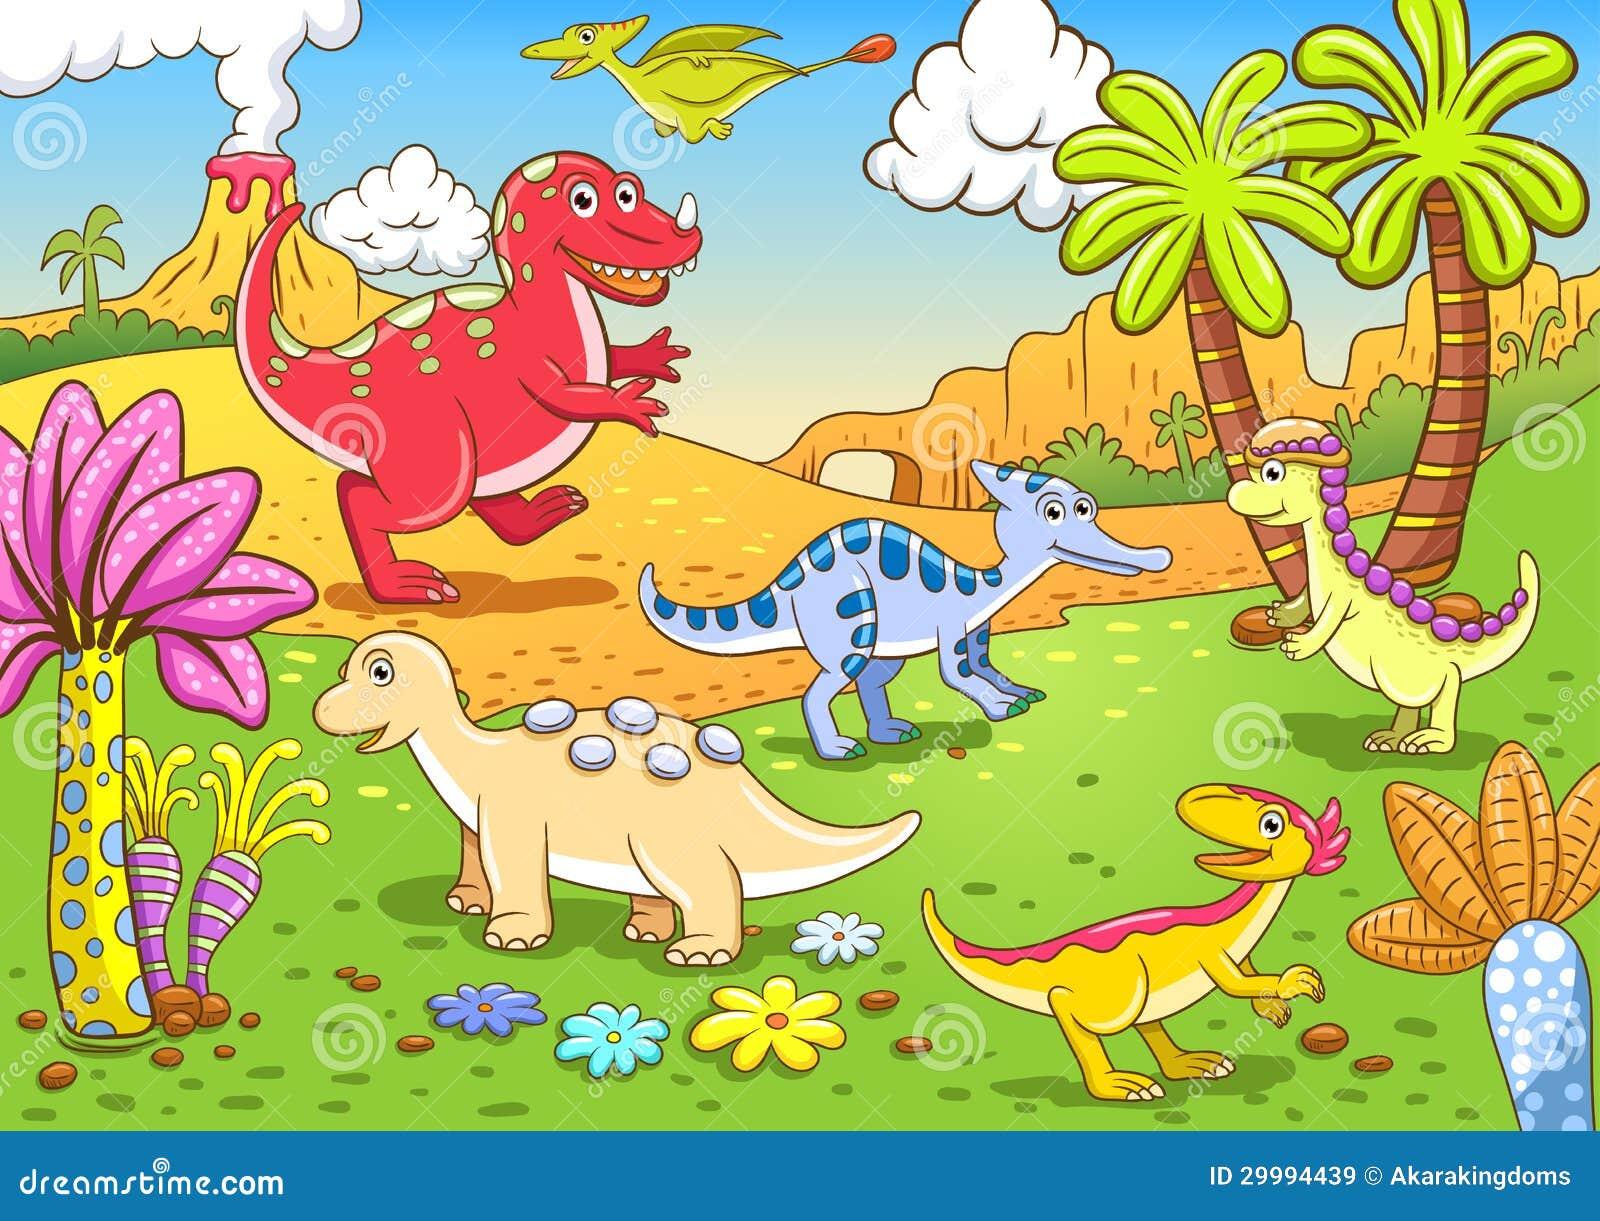 Cute Dinosaurs In Prehistoric Scene Stock Vector Illustration Of Smile Palm 29994439